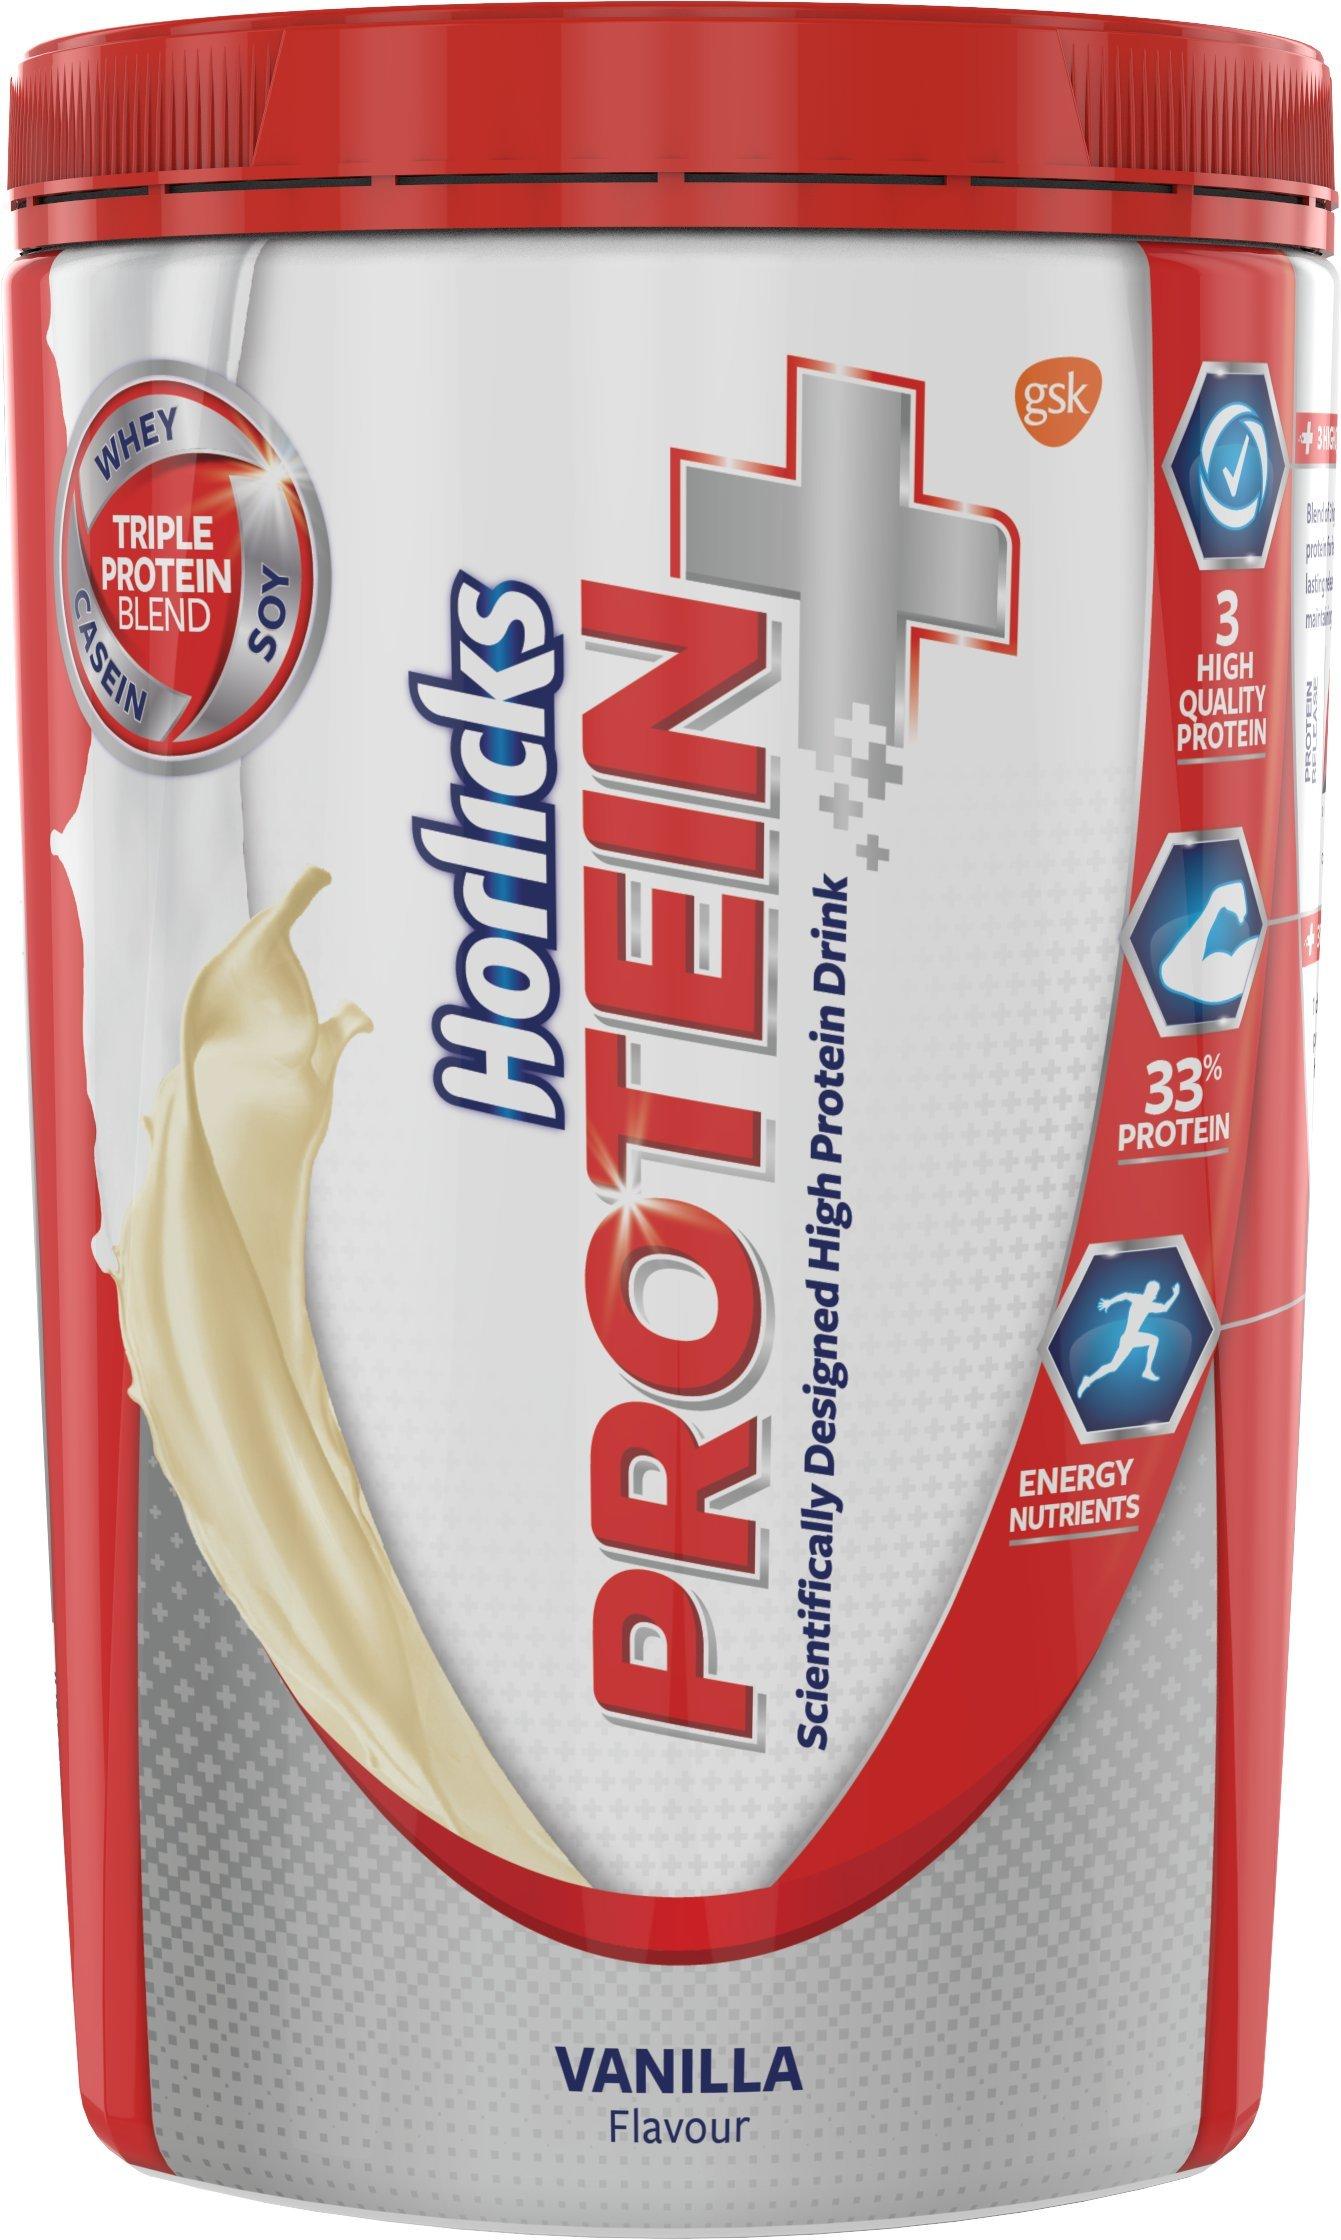 Horlicks Protein Plus Nutrition Drink - 400g (Vanilla)